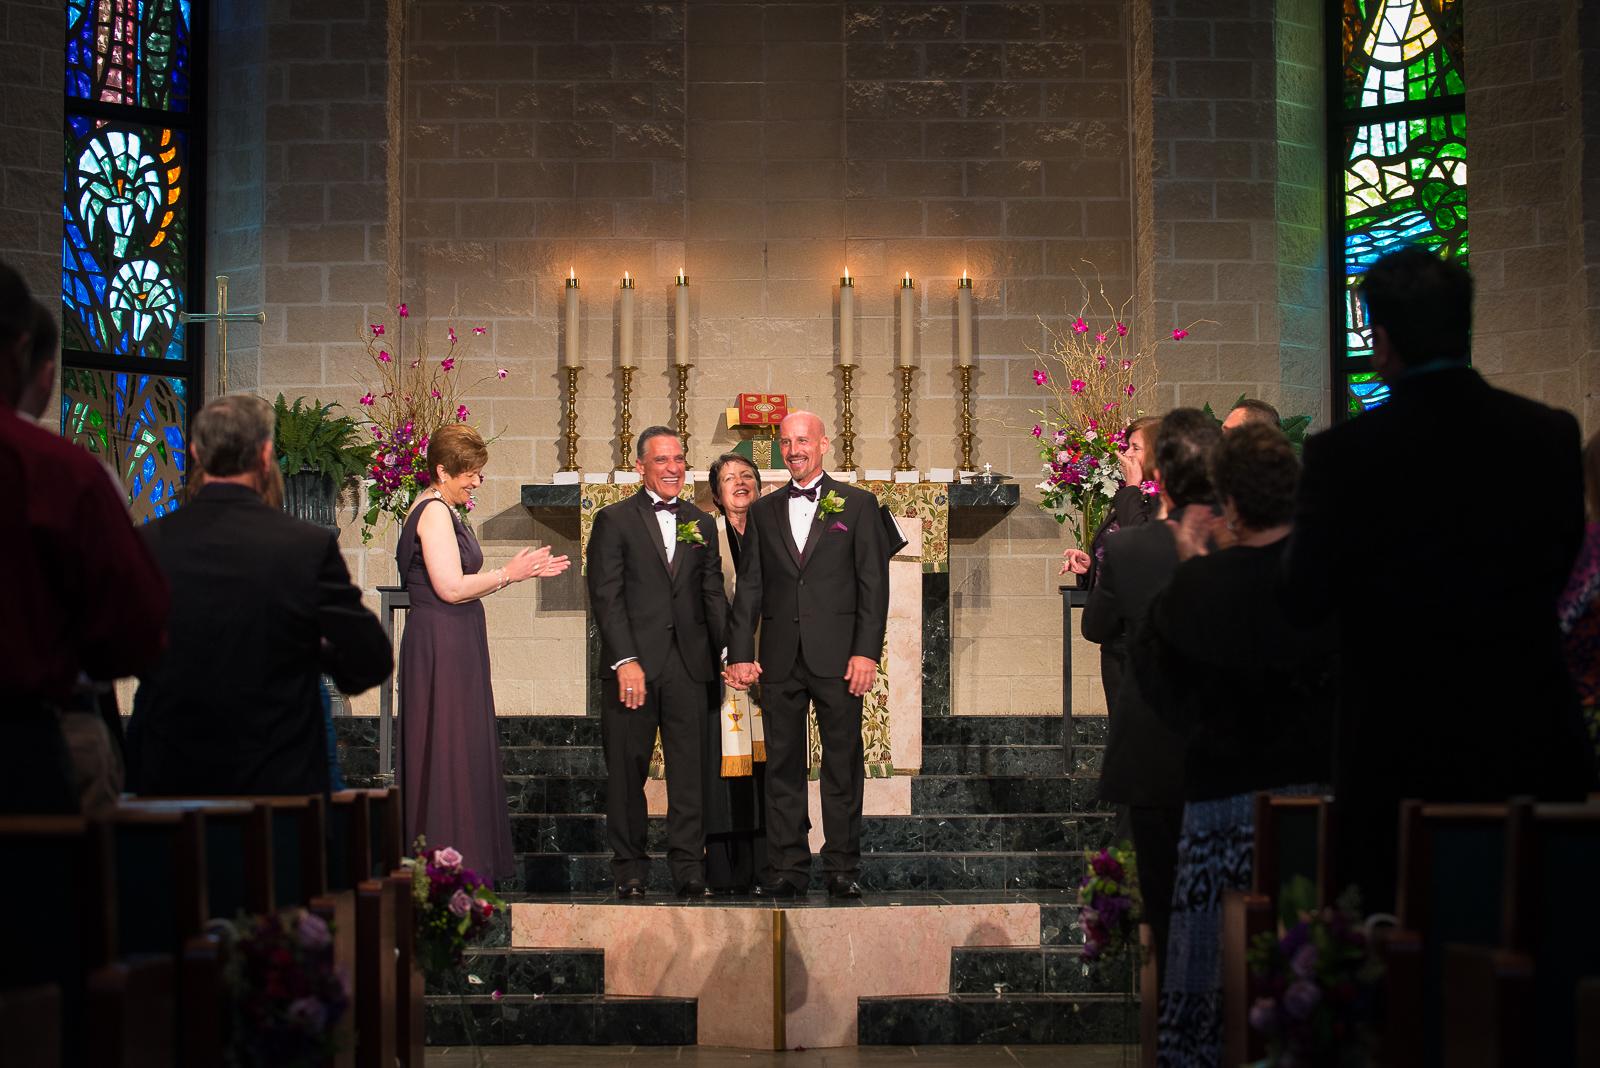 Michael-Napier-Weddings-Ludwig-Guilbeau Wedding-20 (21).jpg